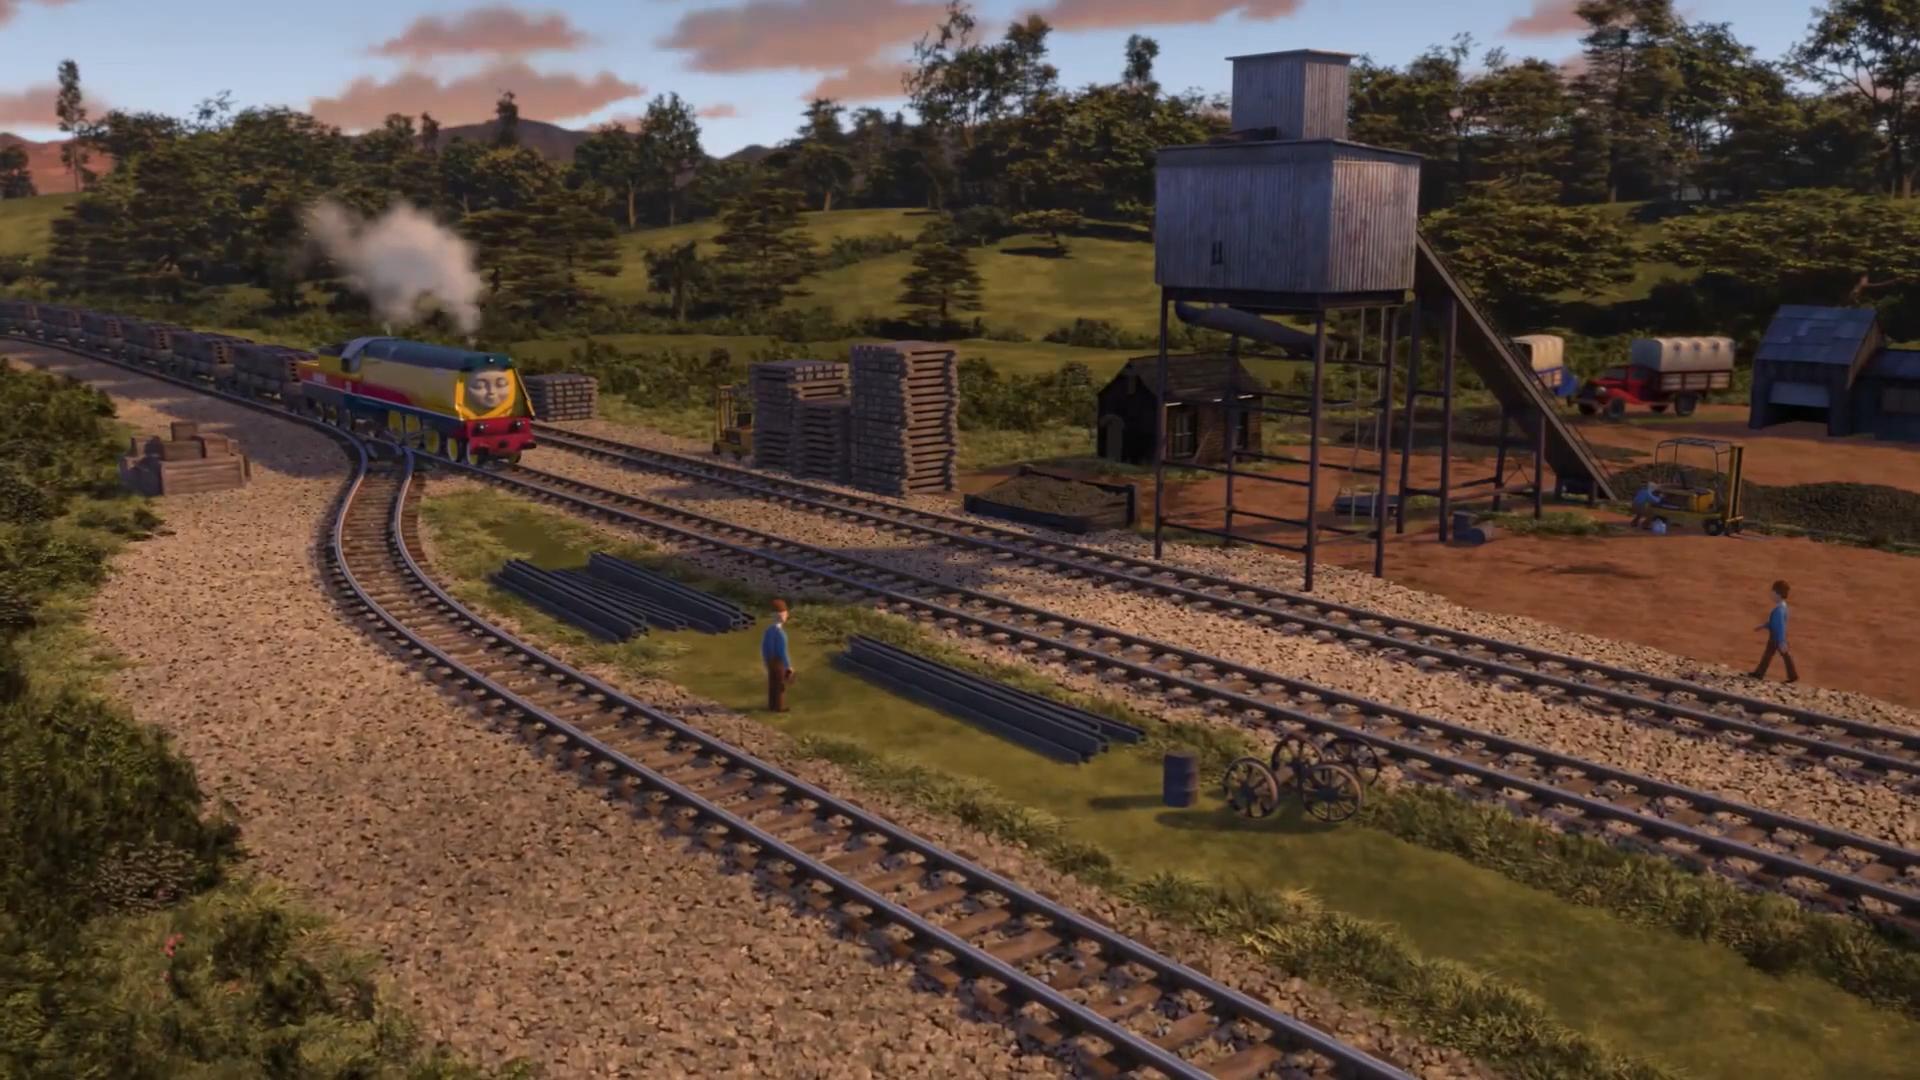 The Coal Hopper